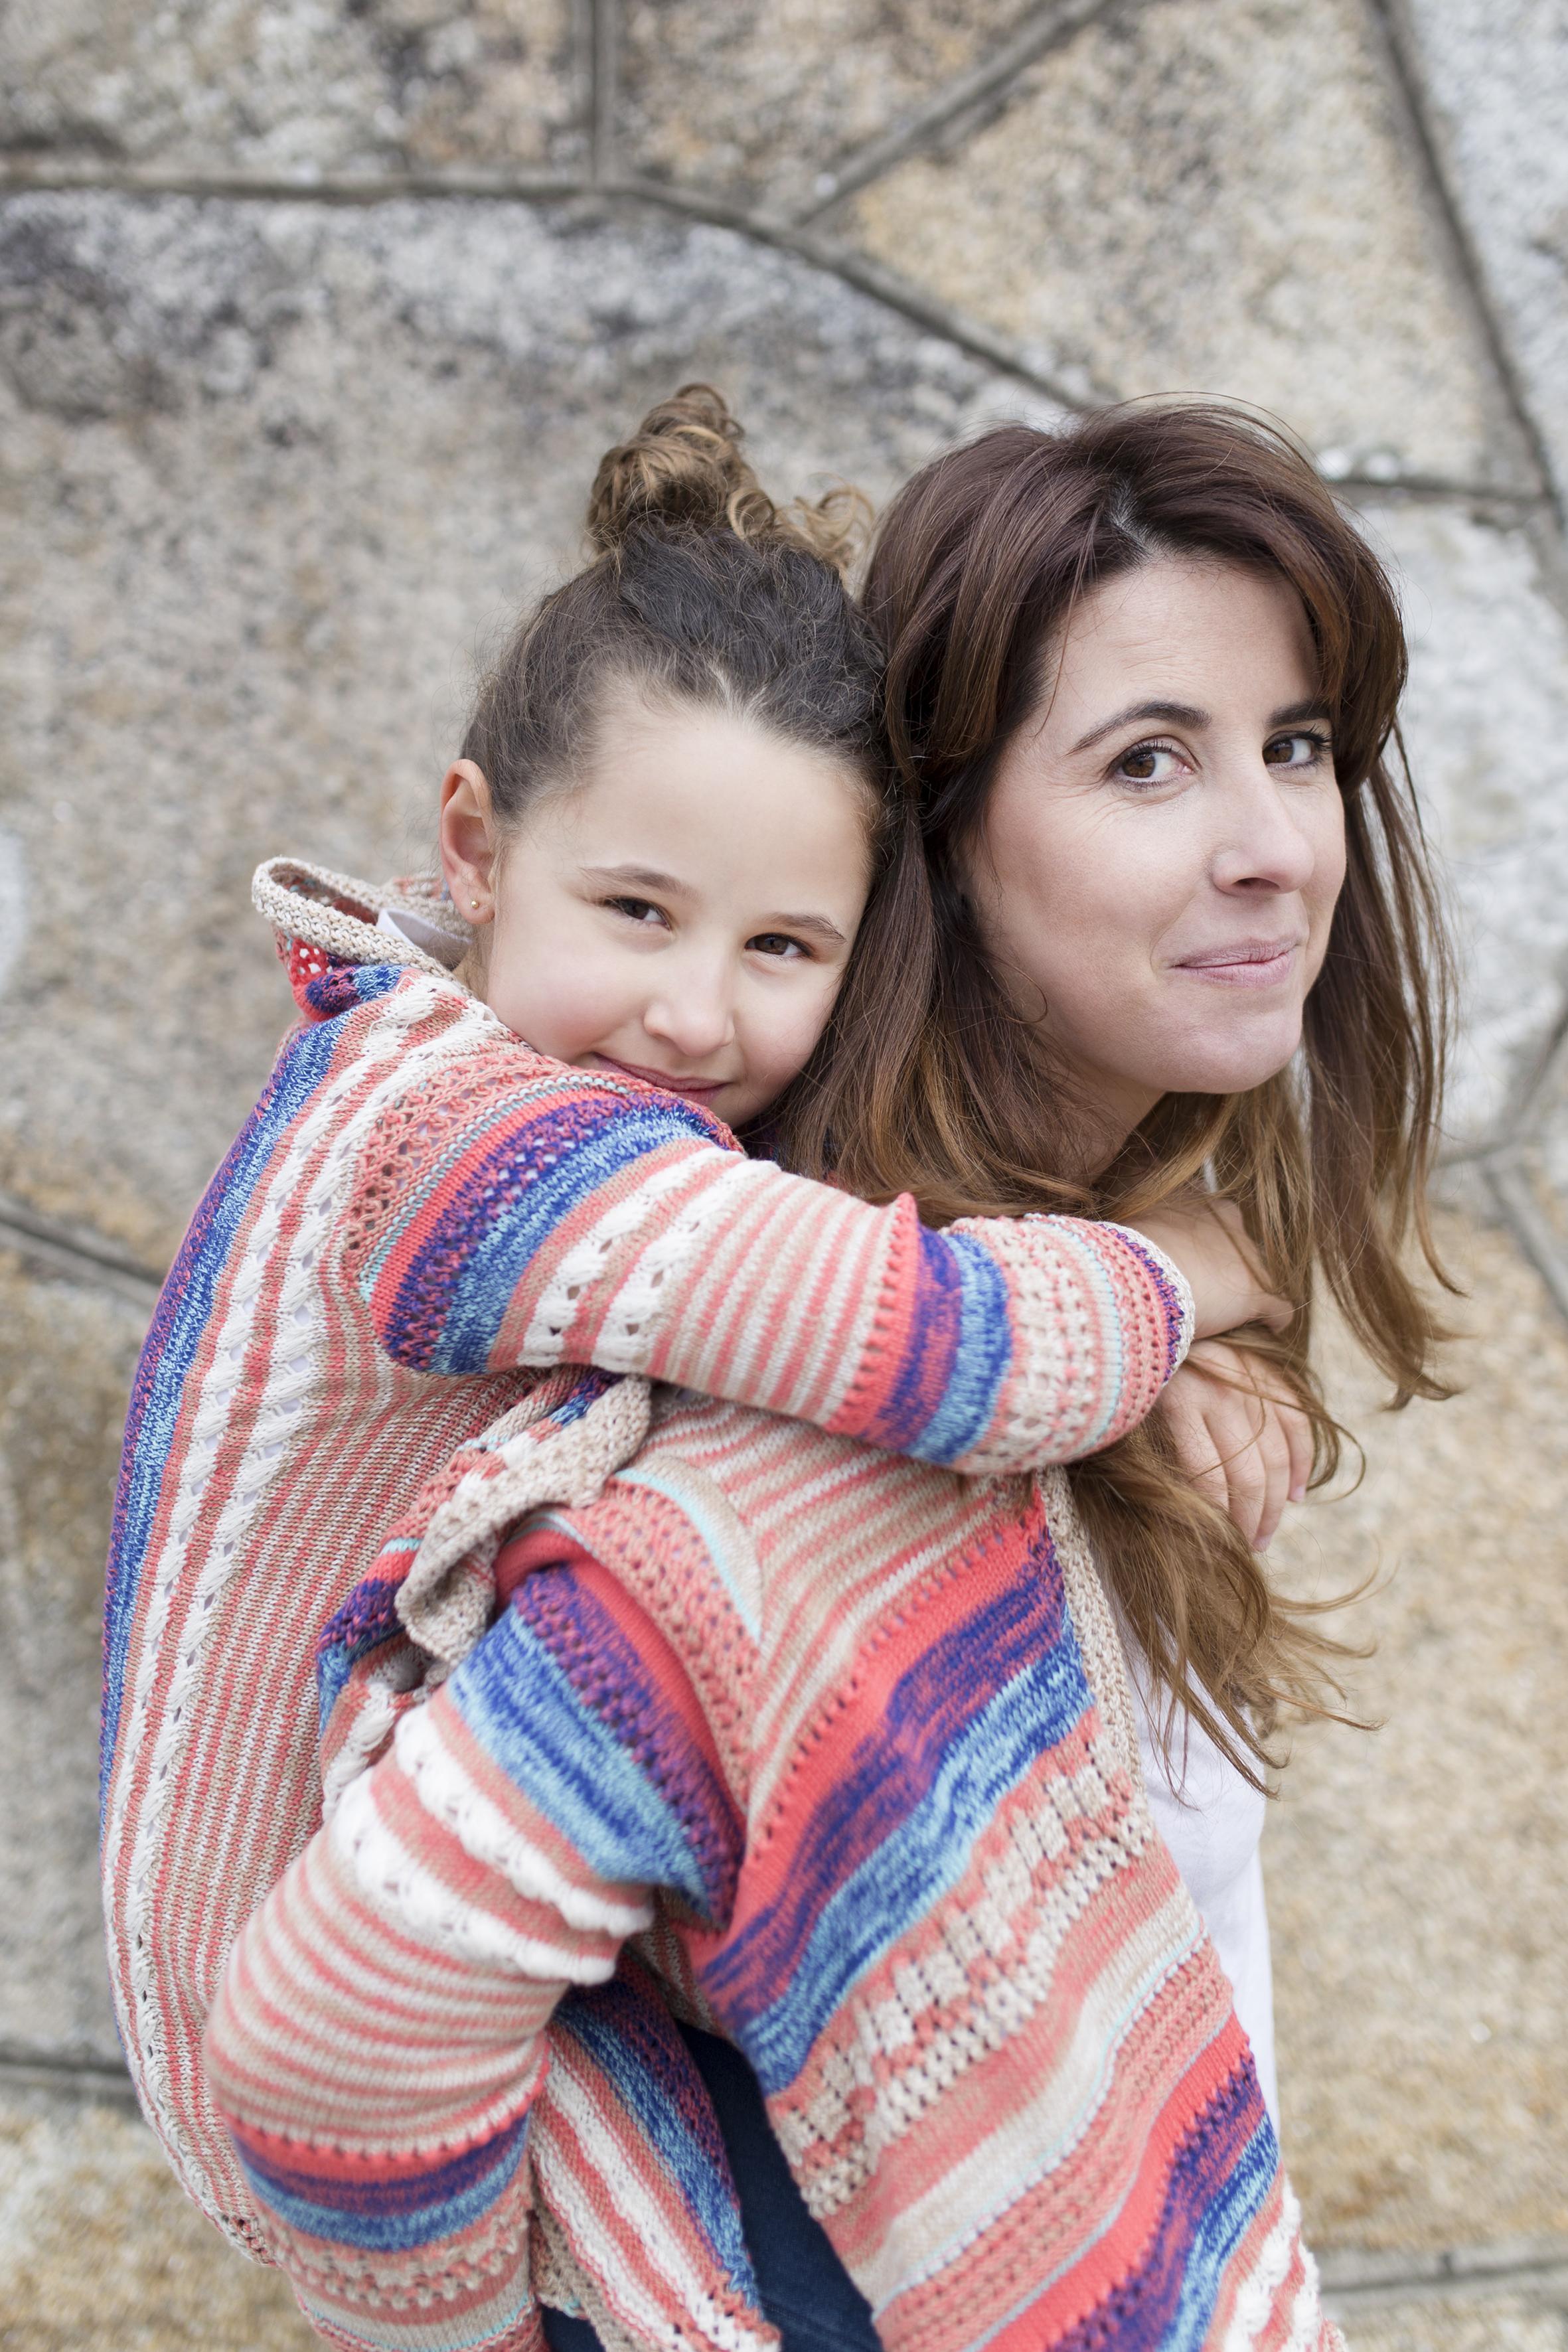 jimena & me-madre e hija-zara kids-Viajar en familia-descalzaporelparque-coruña-lifestyle- kids- converse-daughter